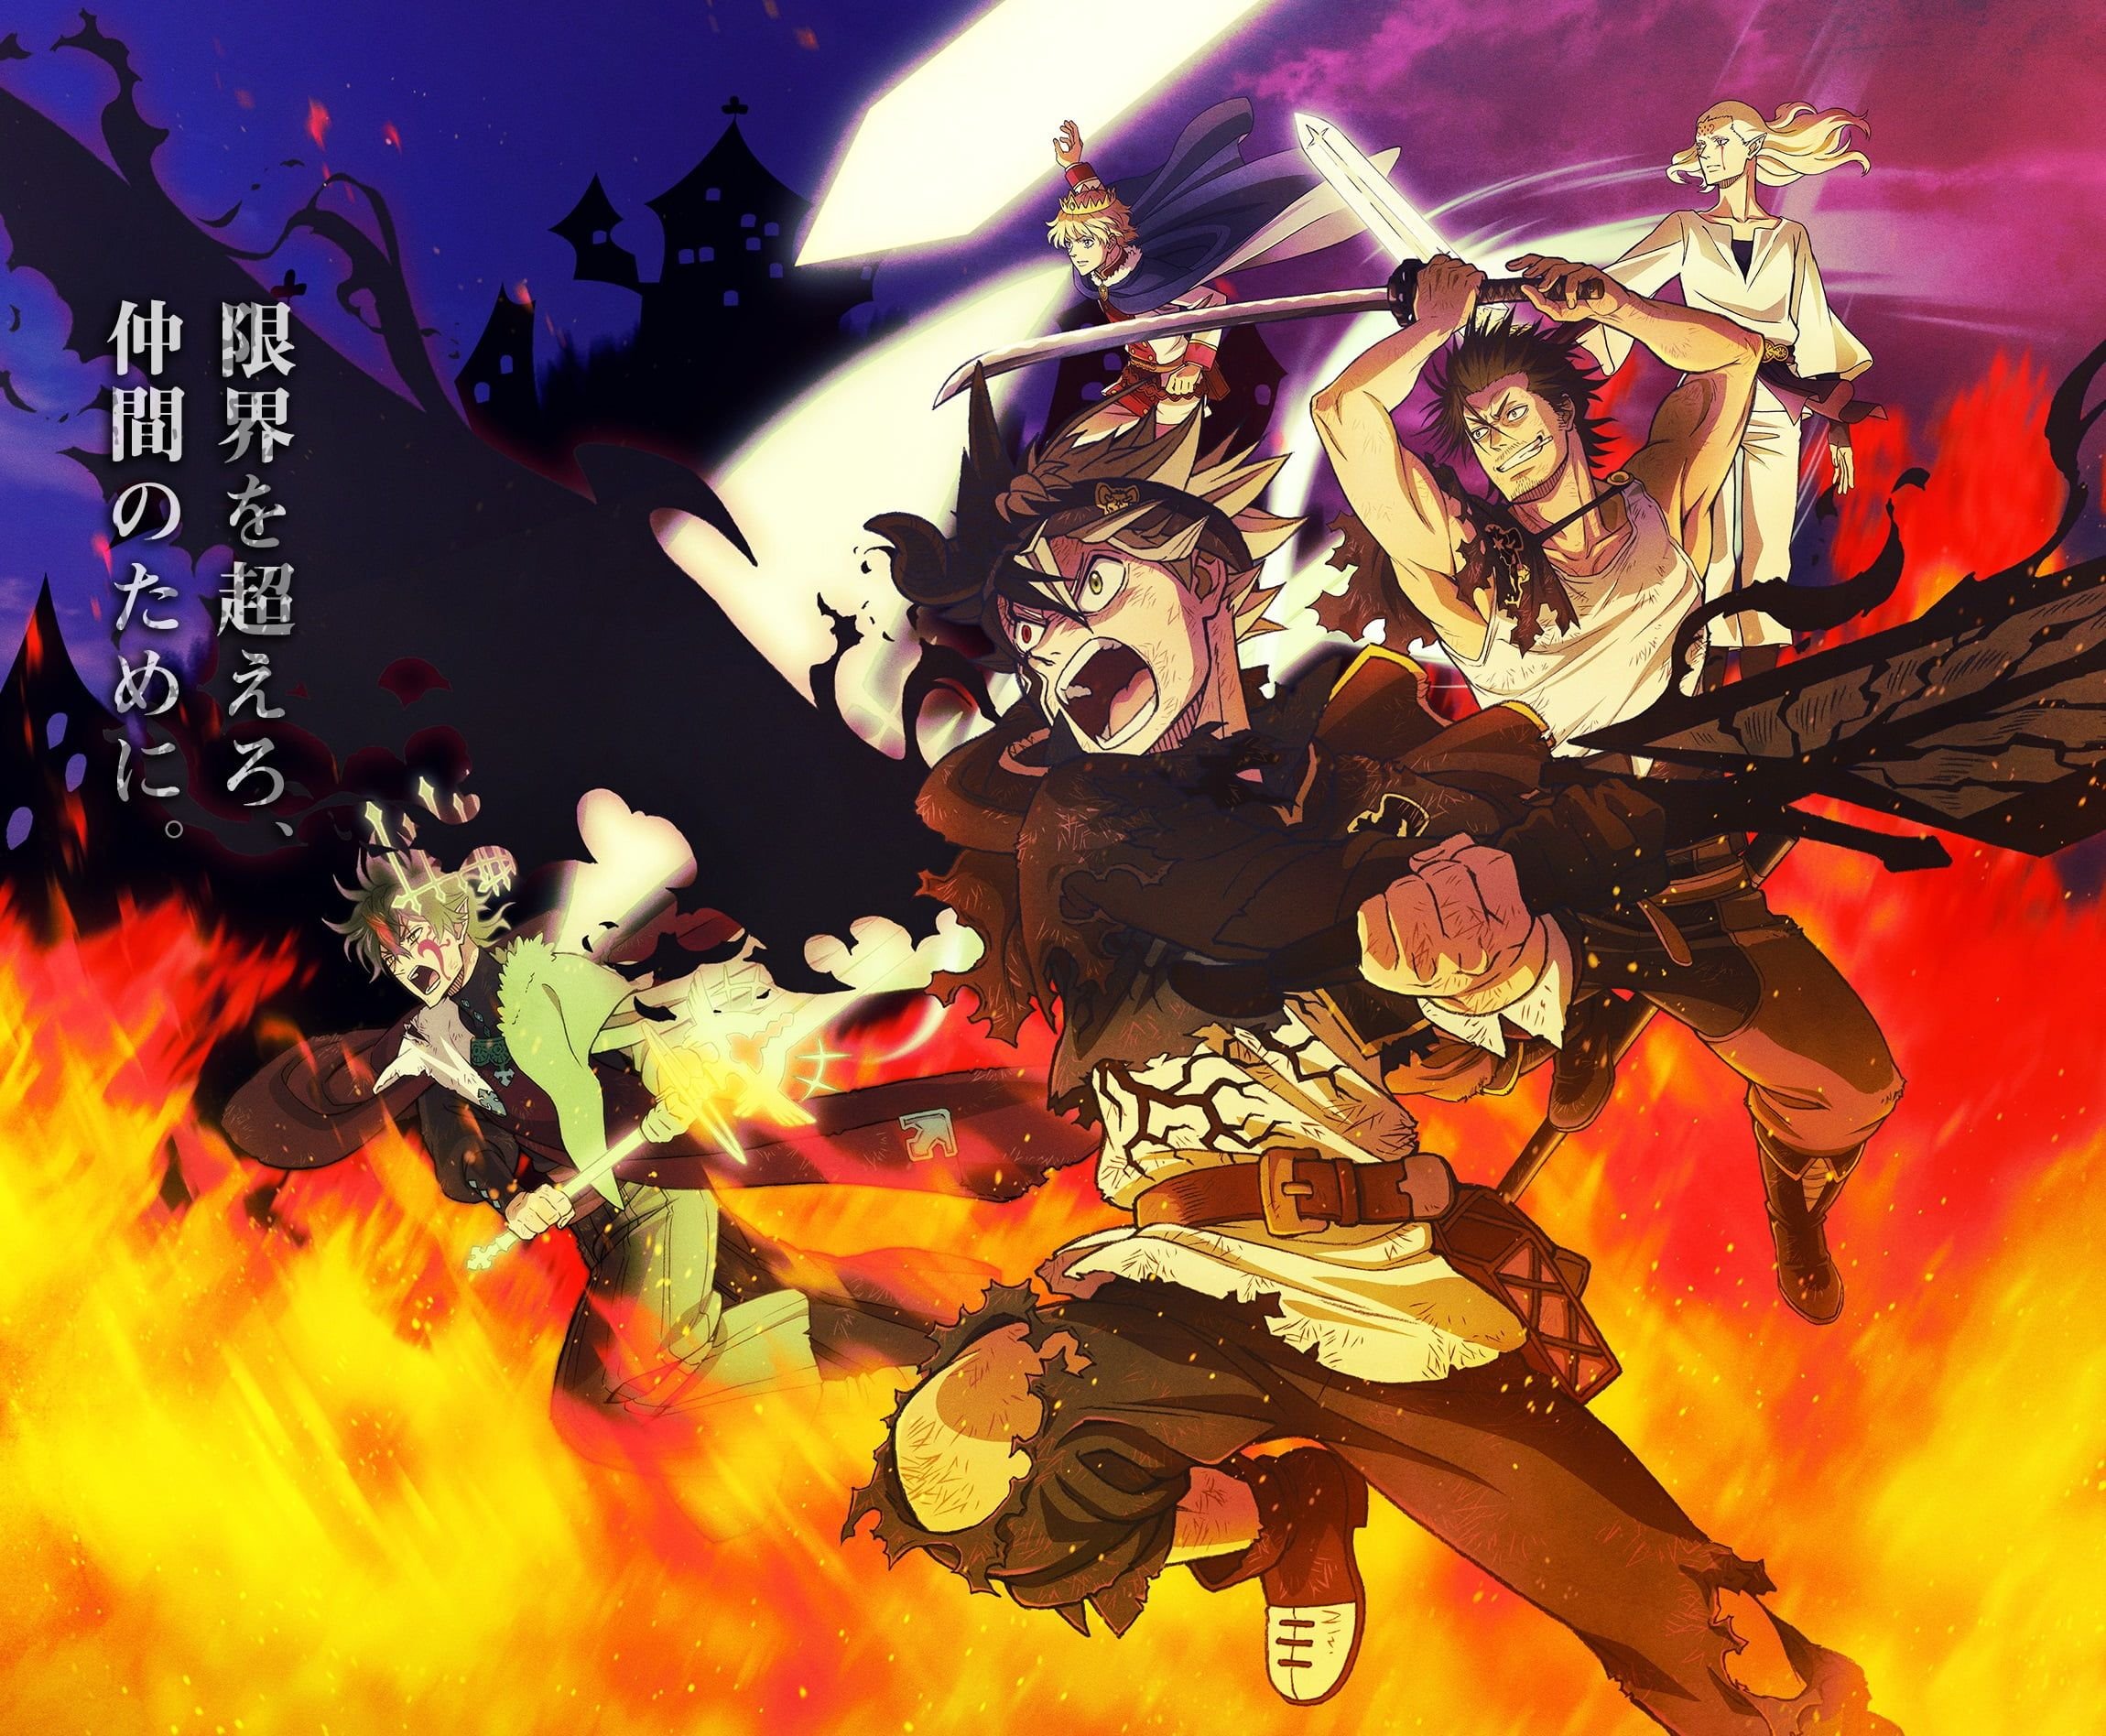 Anime Black Clover Asta Black Clover Yami Sukehiro Yuno Black Clover 1080p Wallpaper Hdwallpaper Desktop In 2020 Black Clover Anime Anime Black Clover Manga